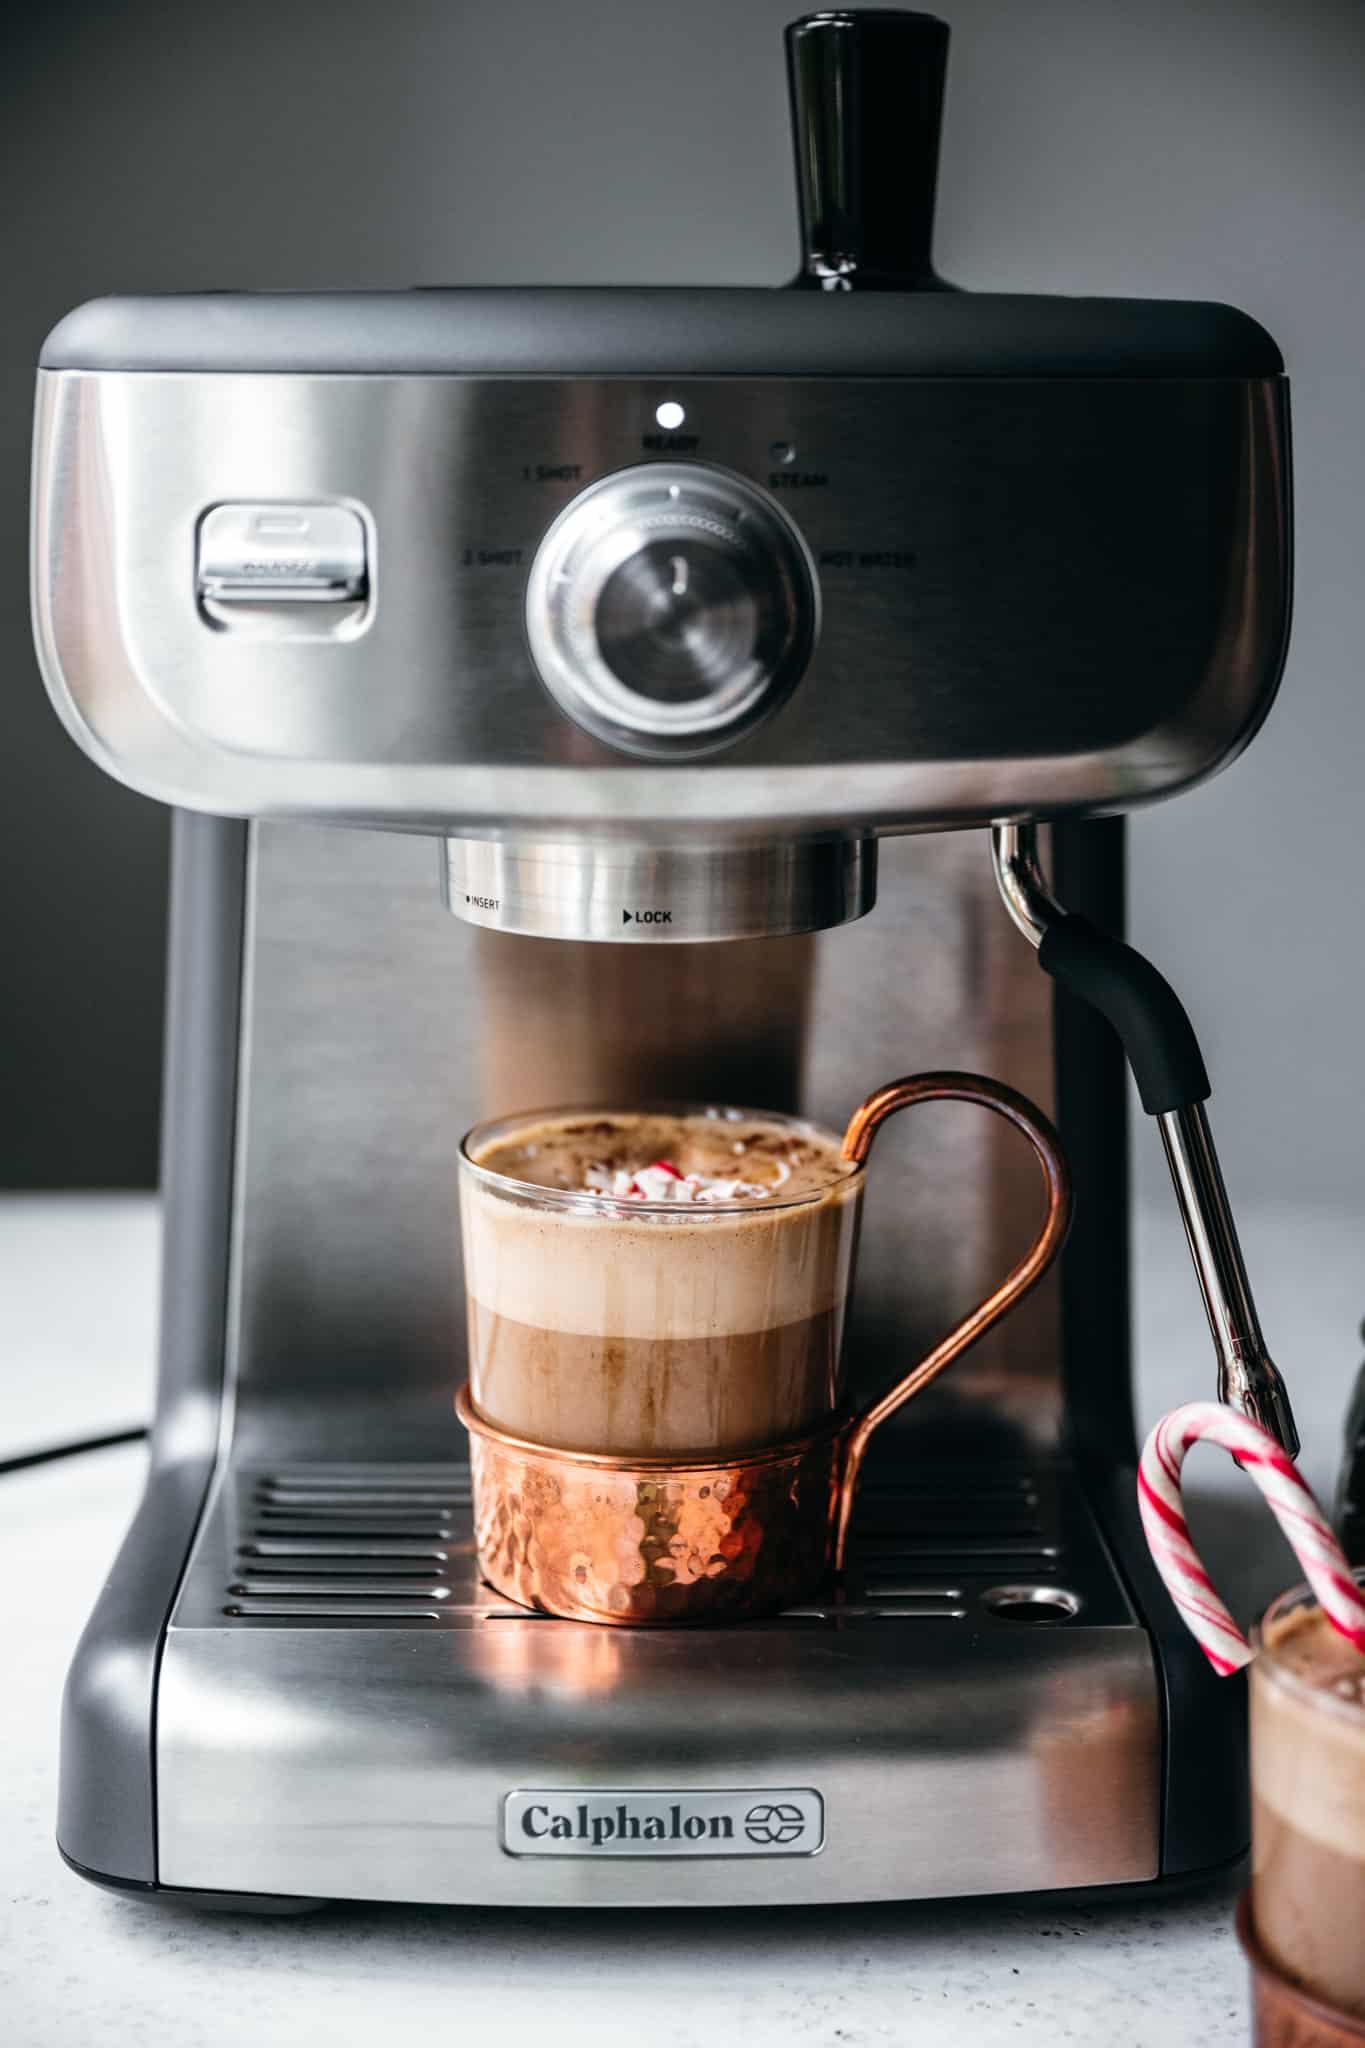 close up view of Calphalon espresso machine with peppermint mocha